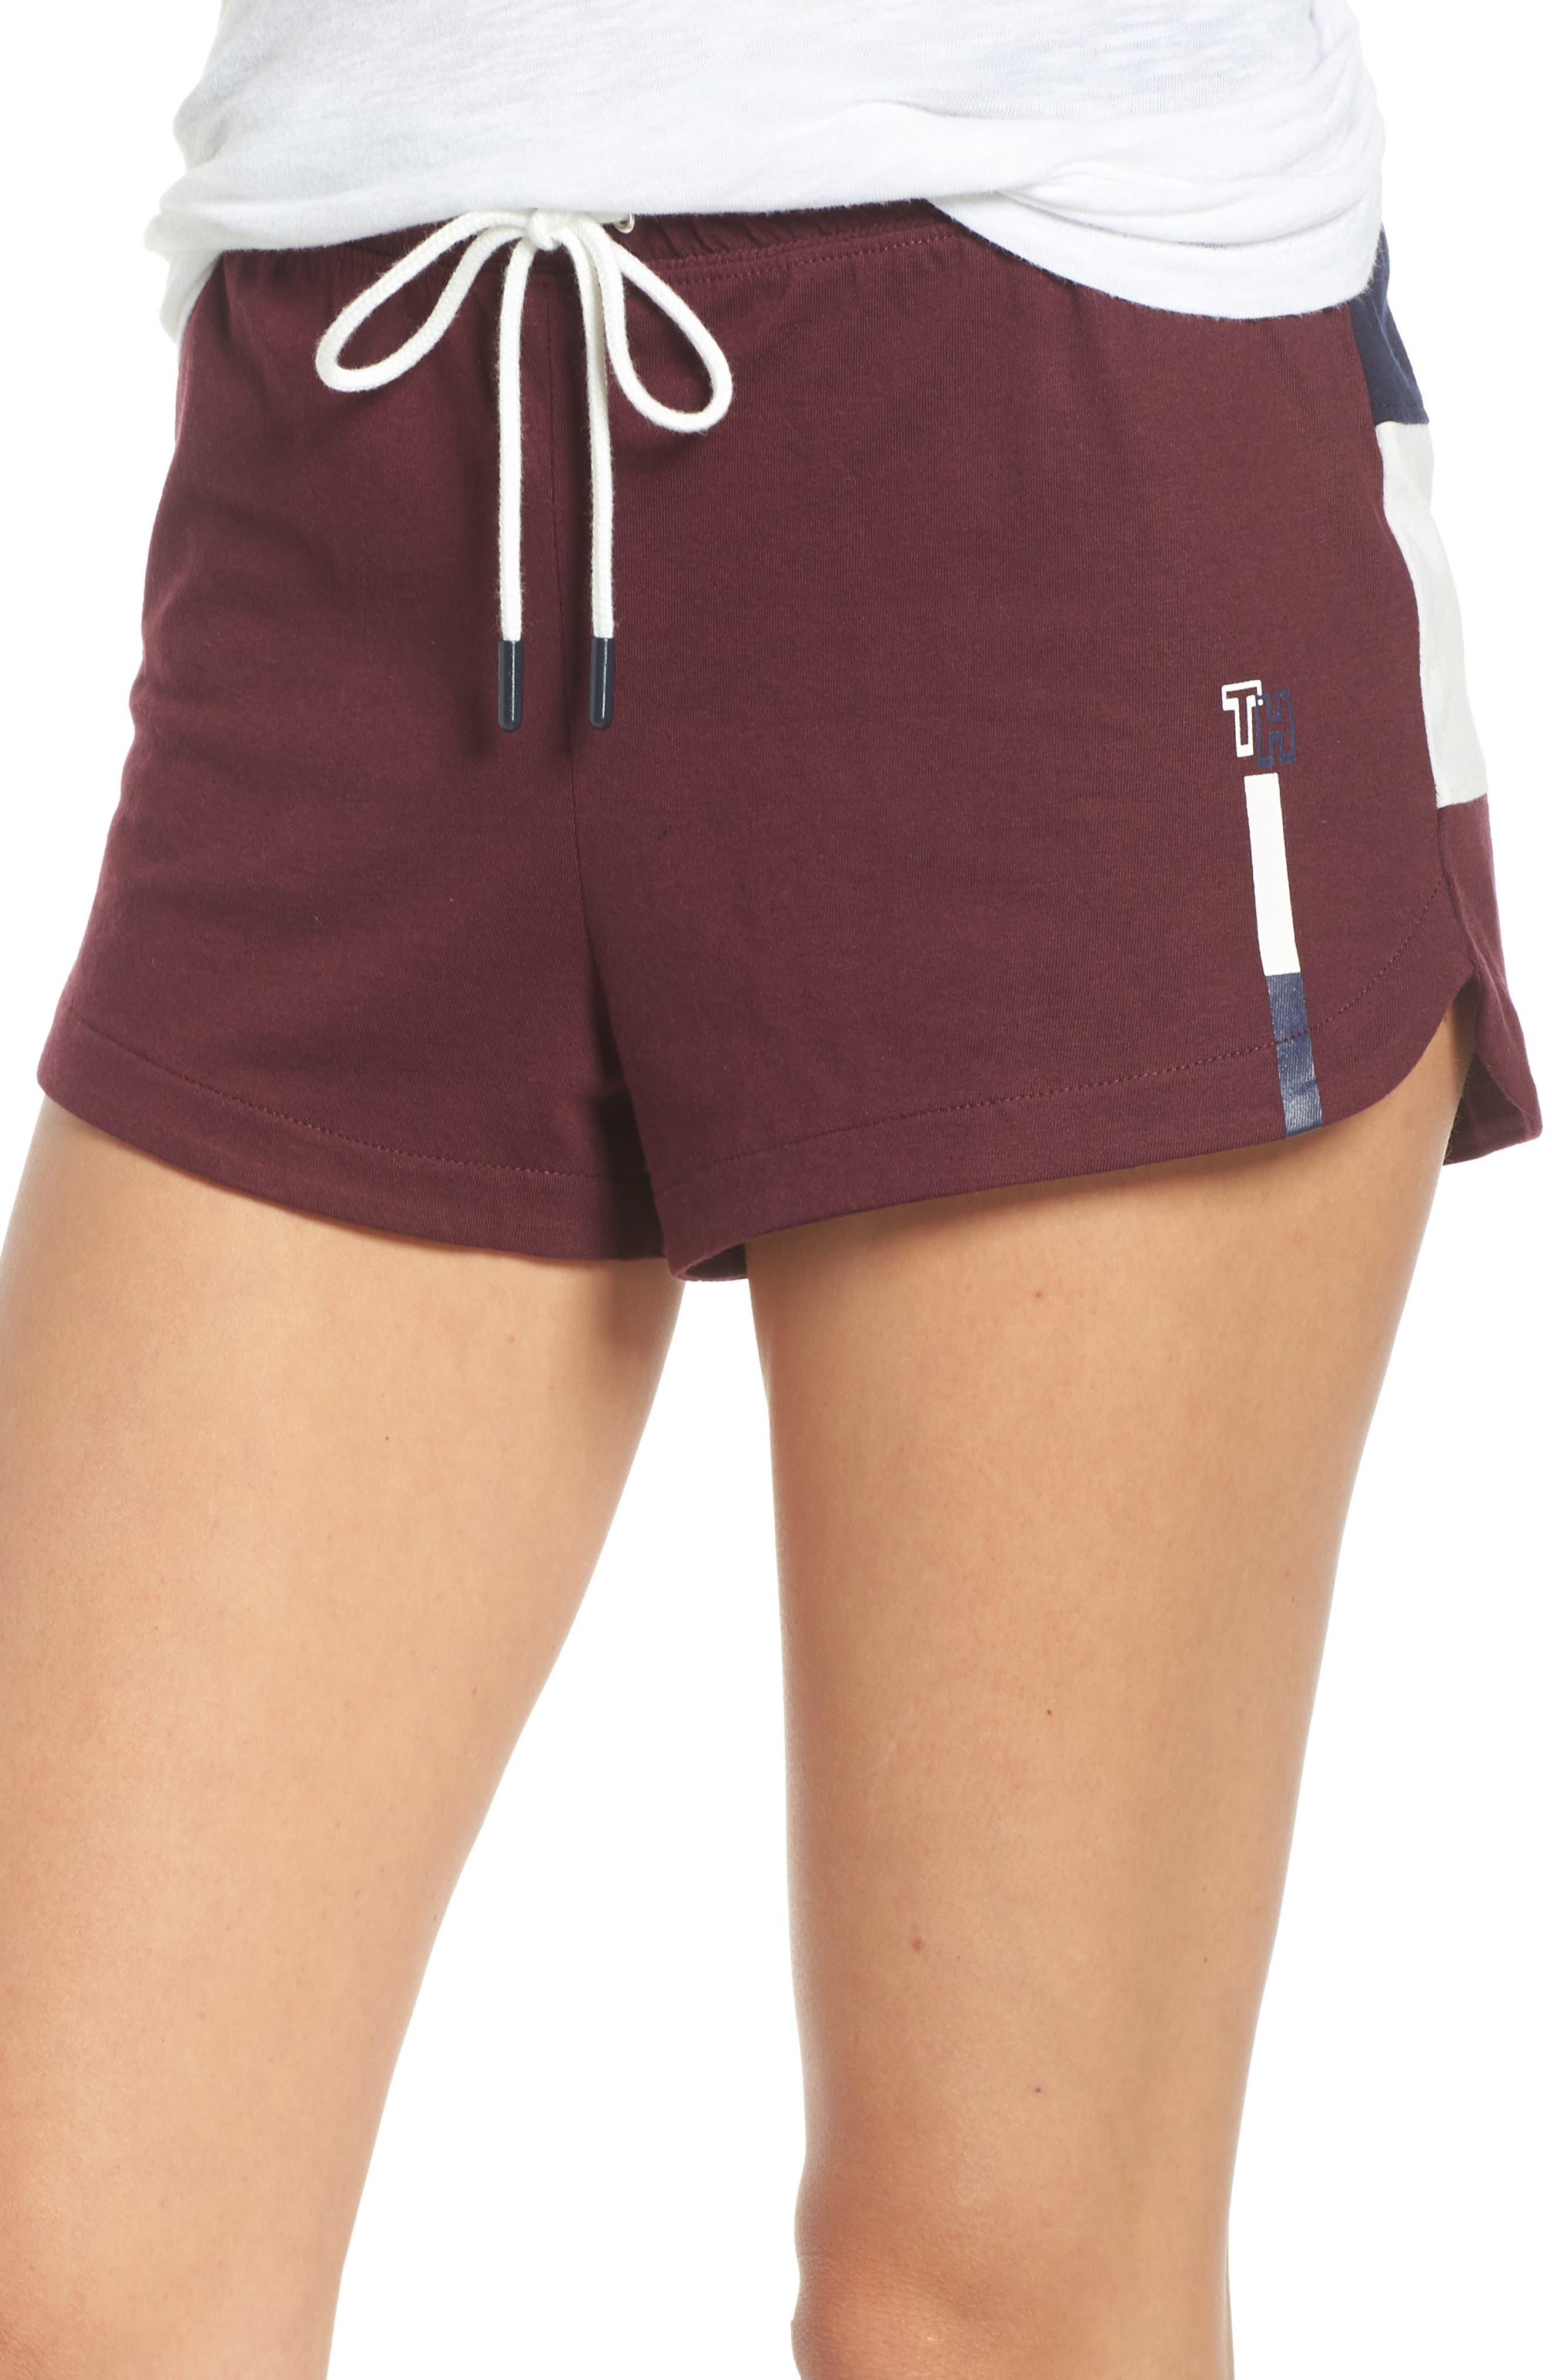 Pajama Tommy Shorts Pajama Hilfiger Stripe Stripe Tommy Shorts Tommy Hilfiger Hilfiger wOqqt7Rp